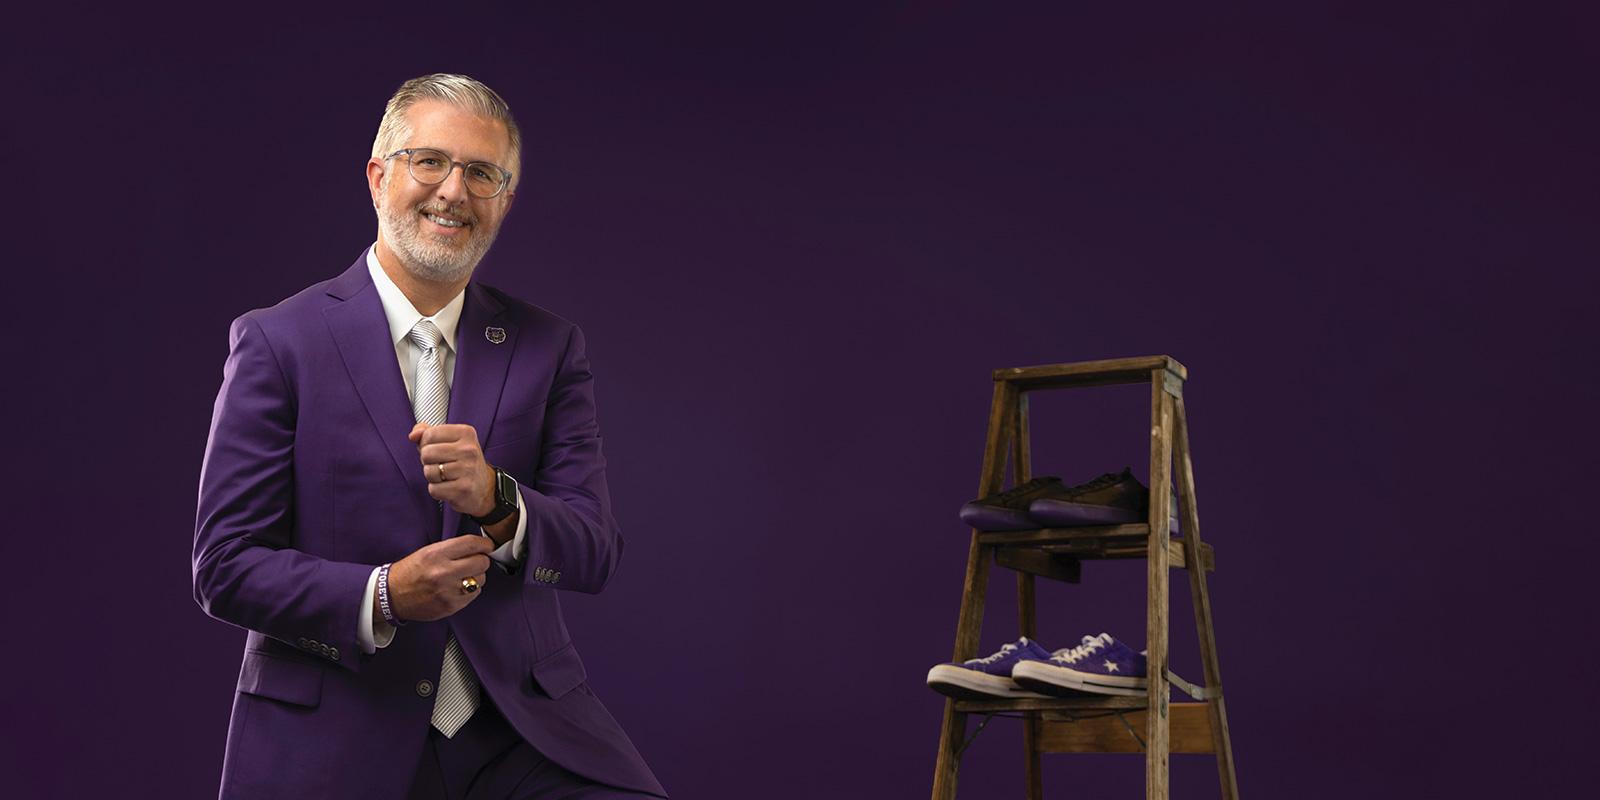 Purple Attire Inspires School Spirit